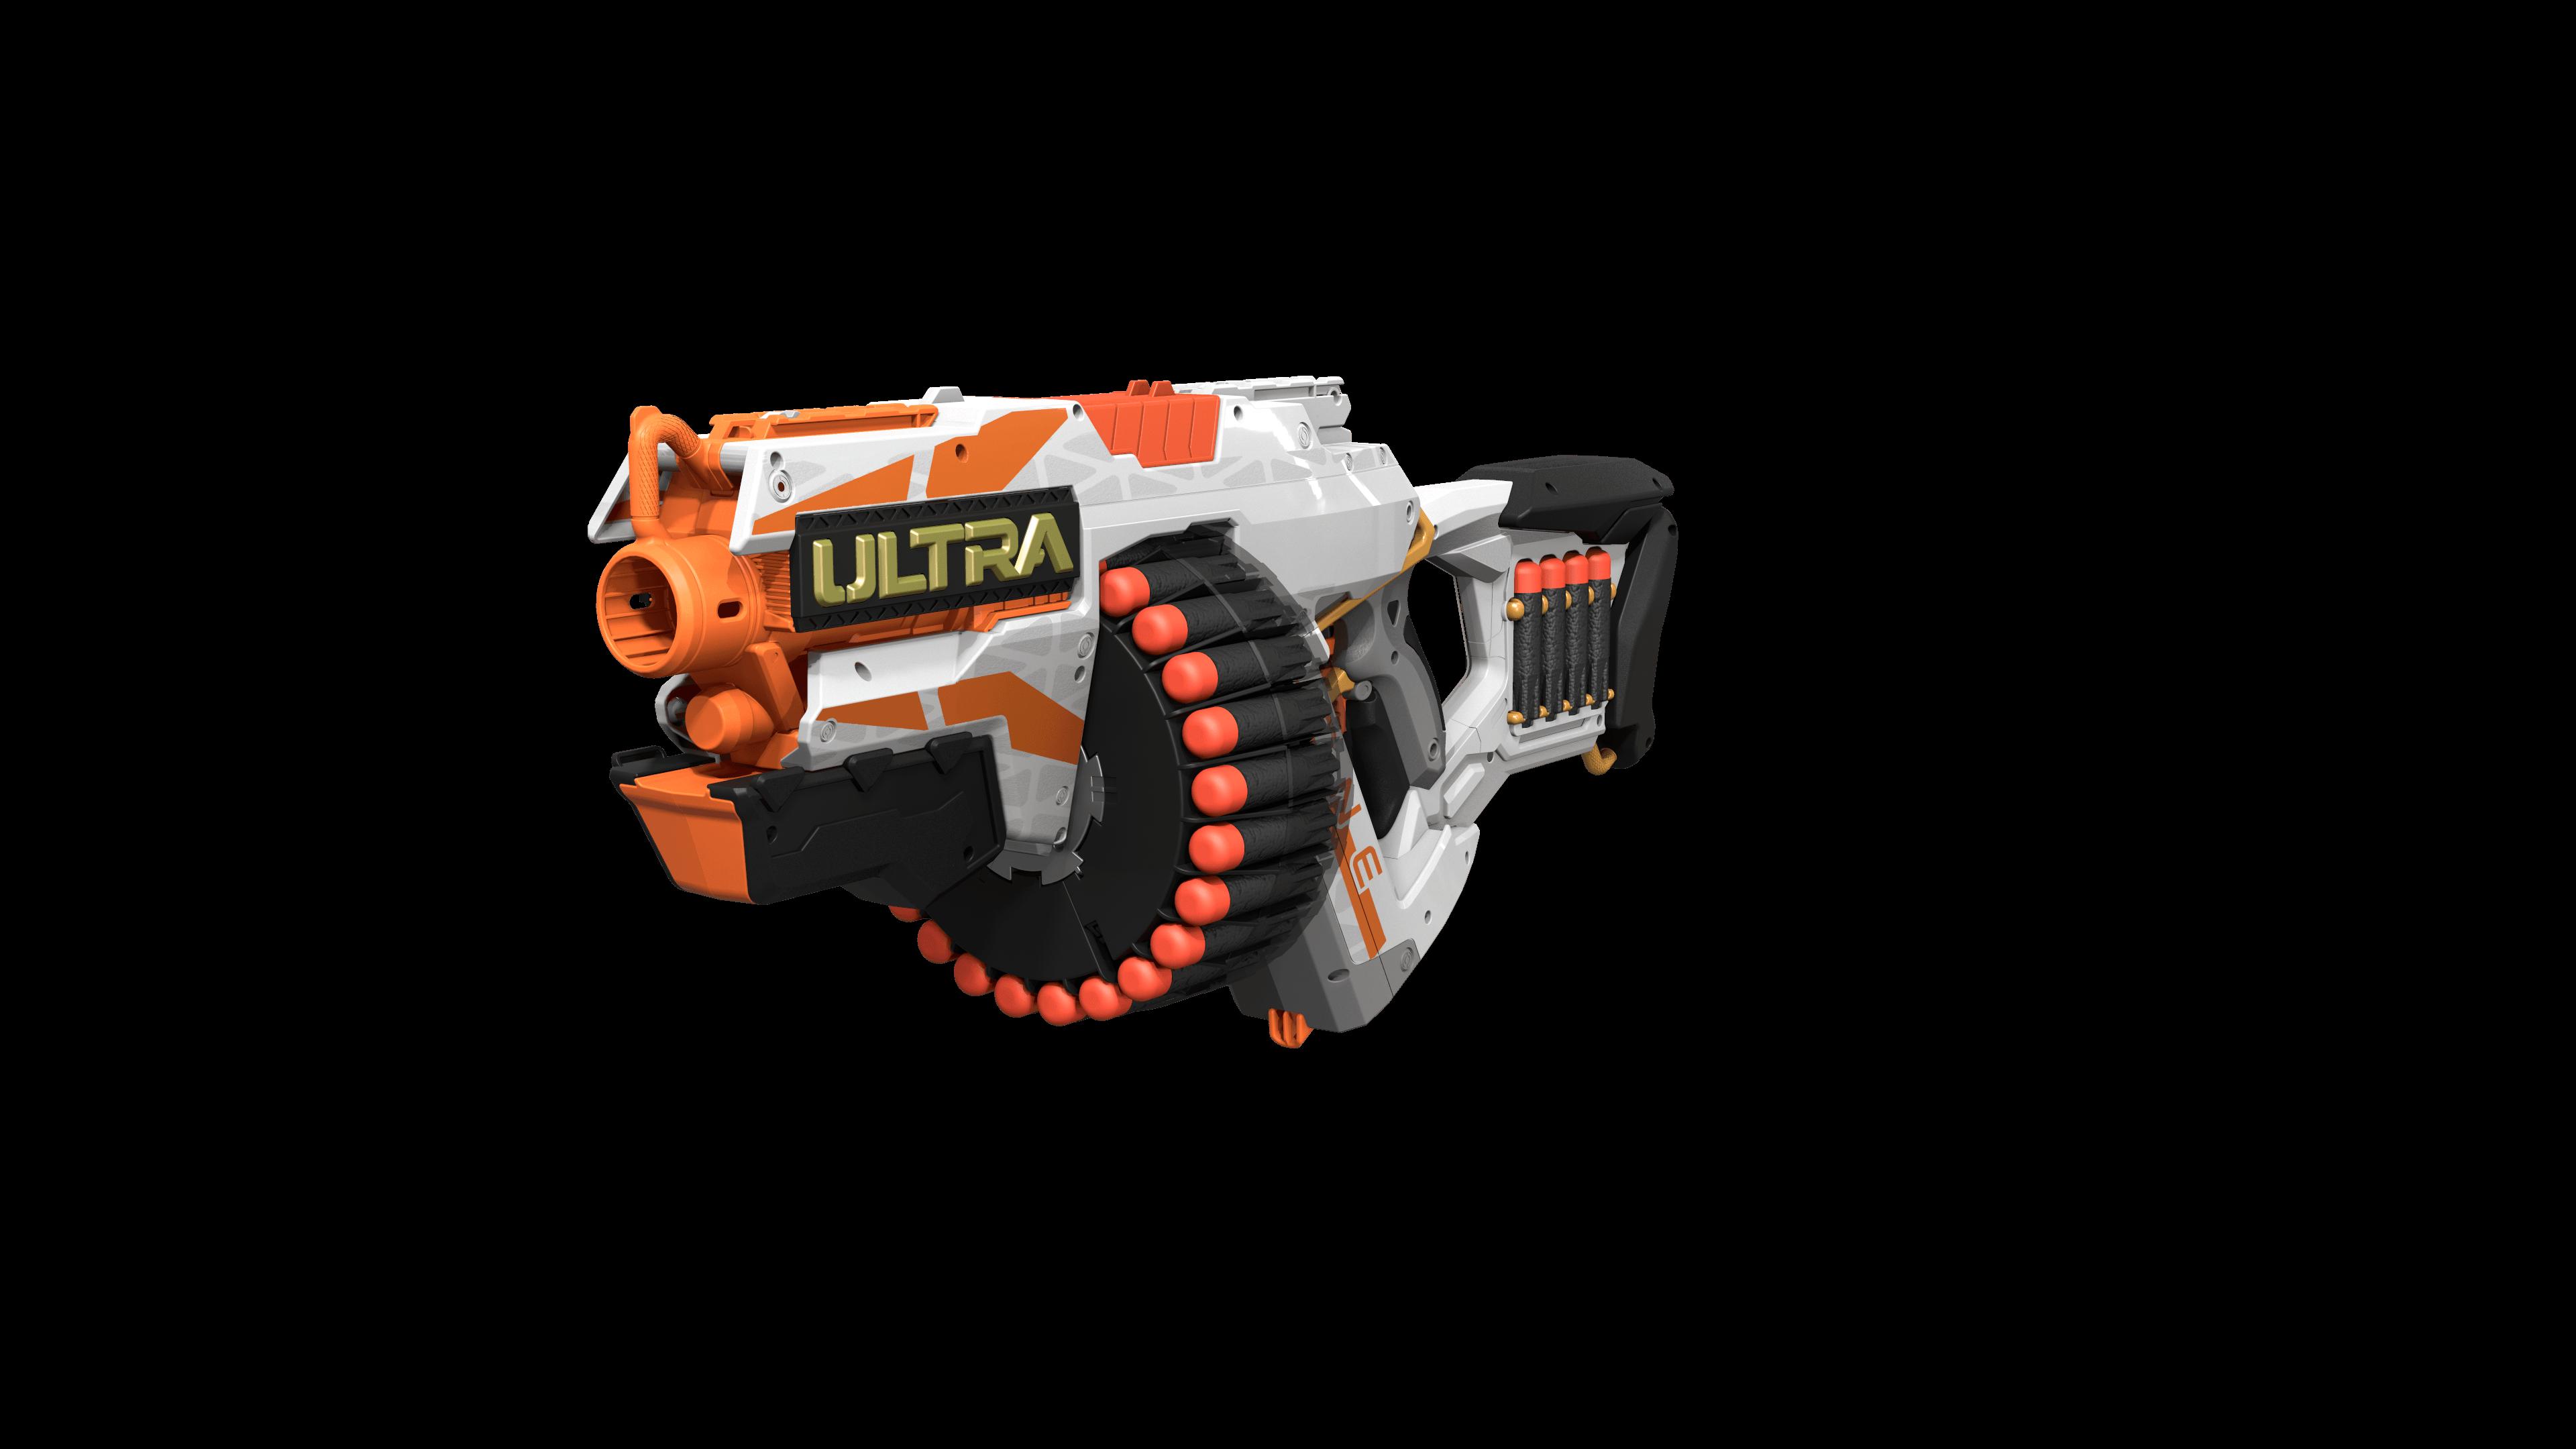 ultra blaster img 79